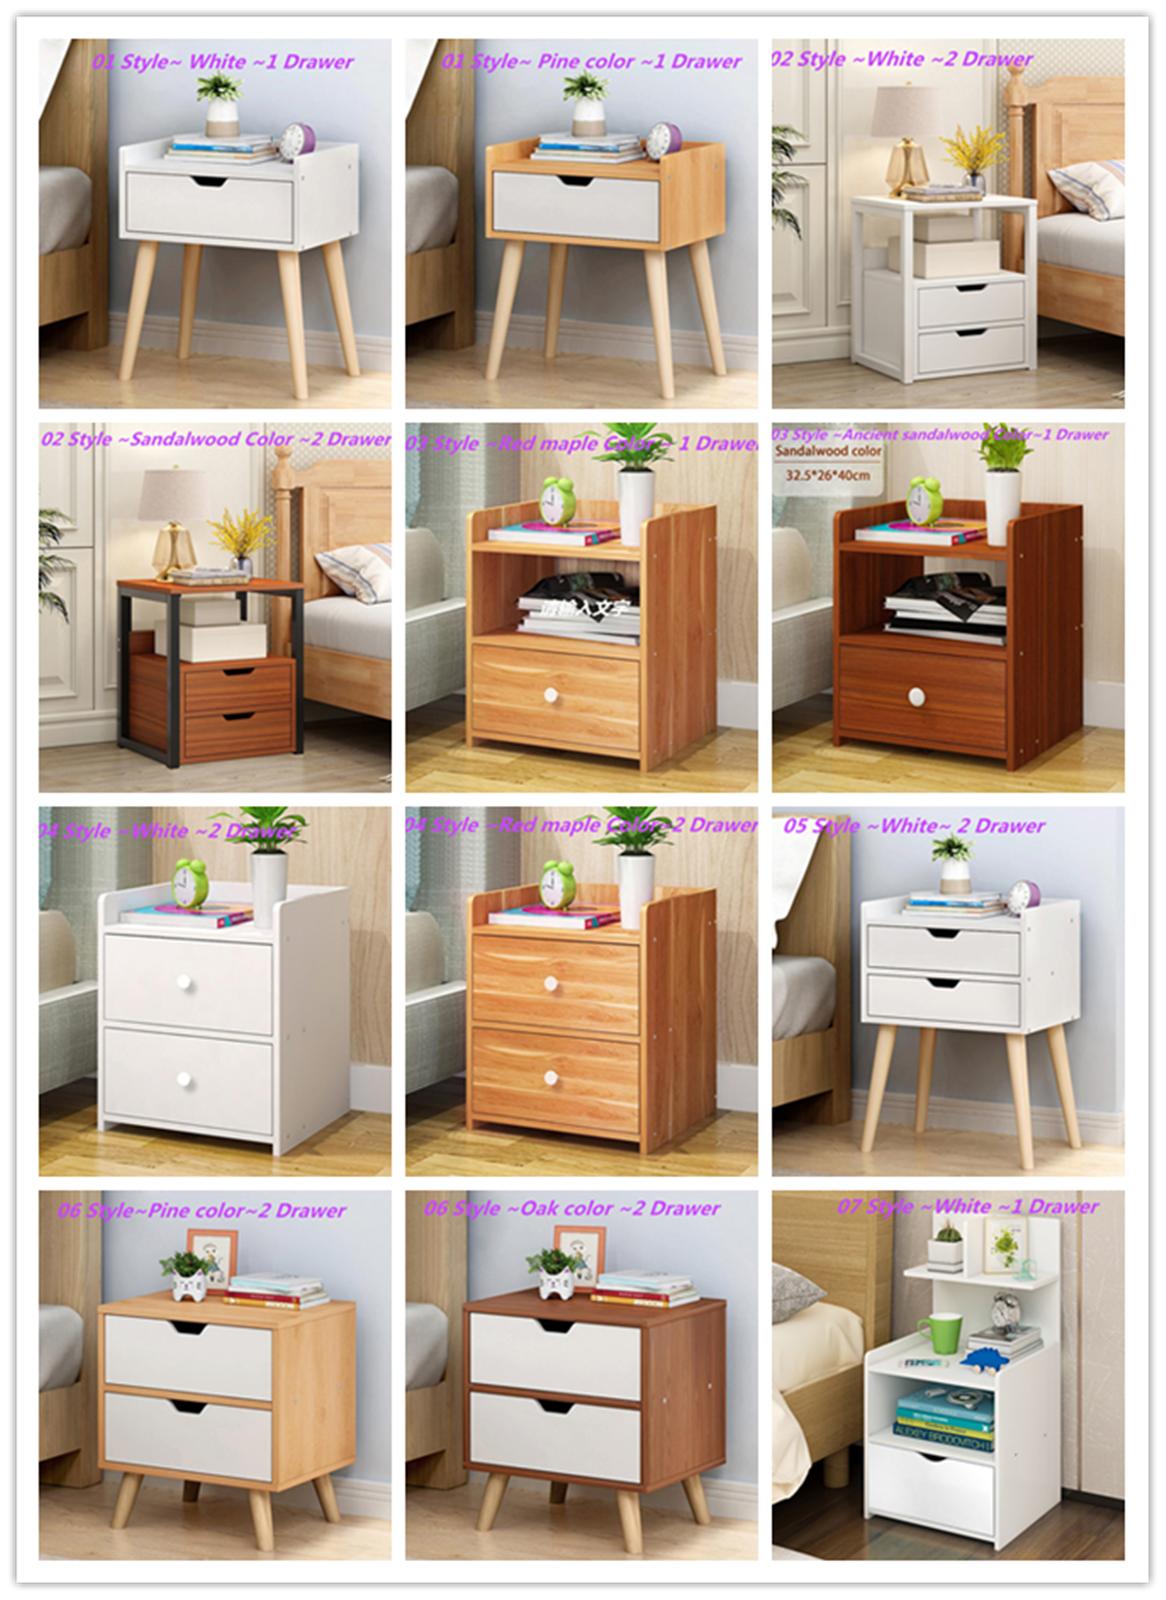 Christow Oak Effect 2 Drawer Bedside Table Bedroom Cabinet Nightstand H54cm